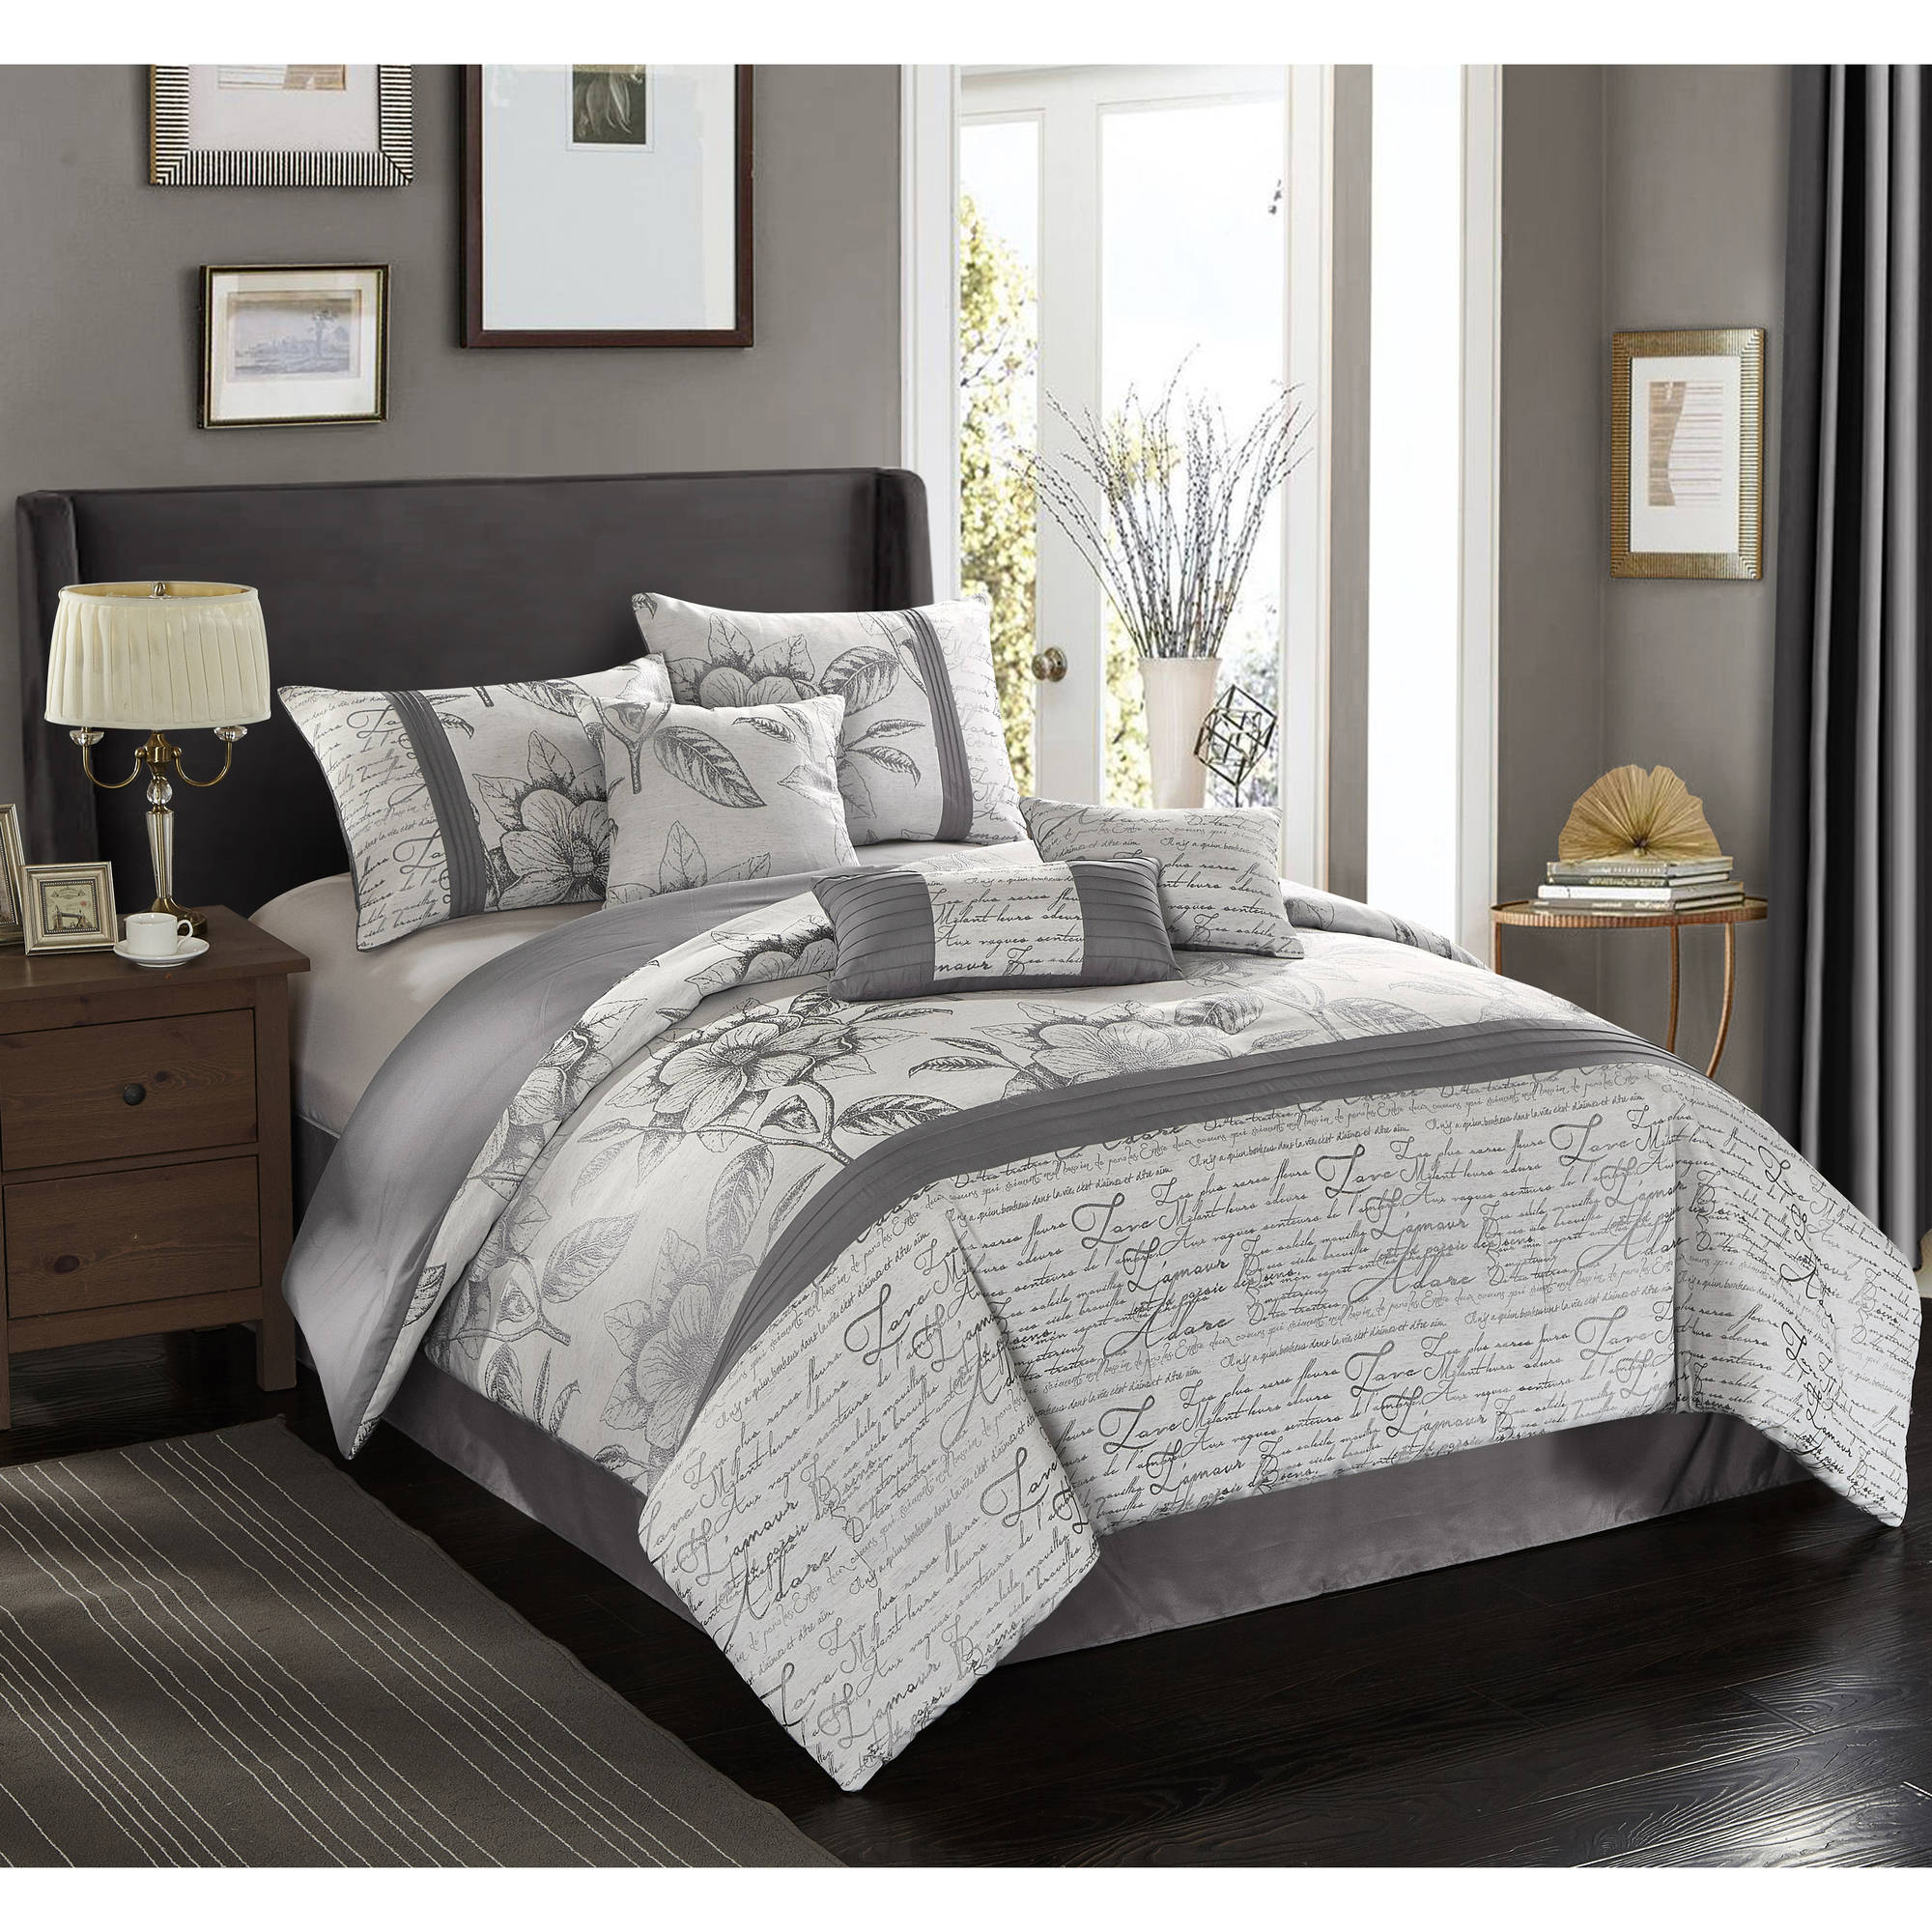 by queen new bedding air p york comforter velveteen set j damask silver bel